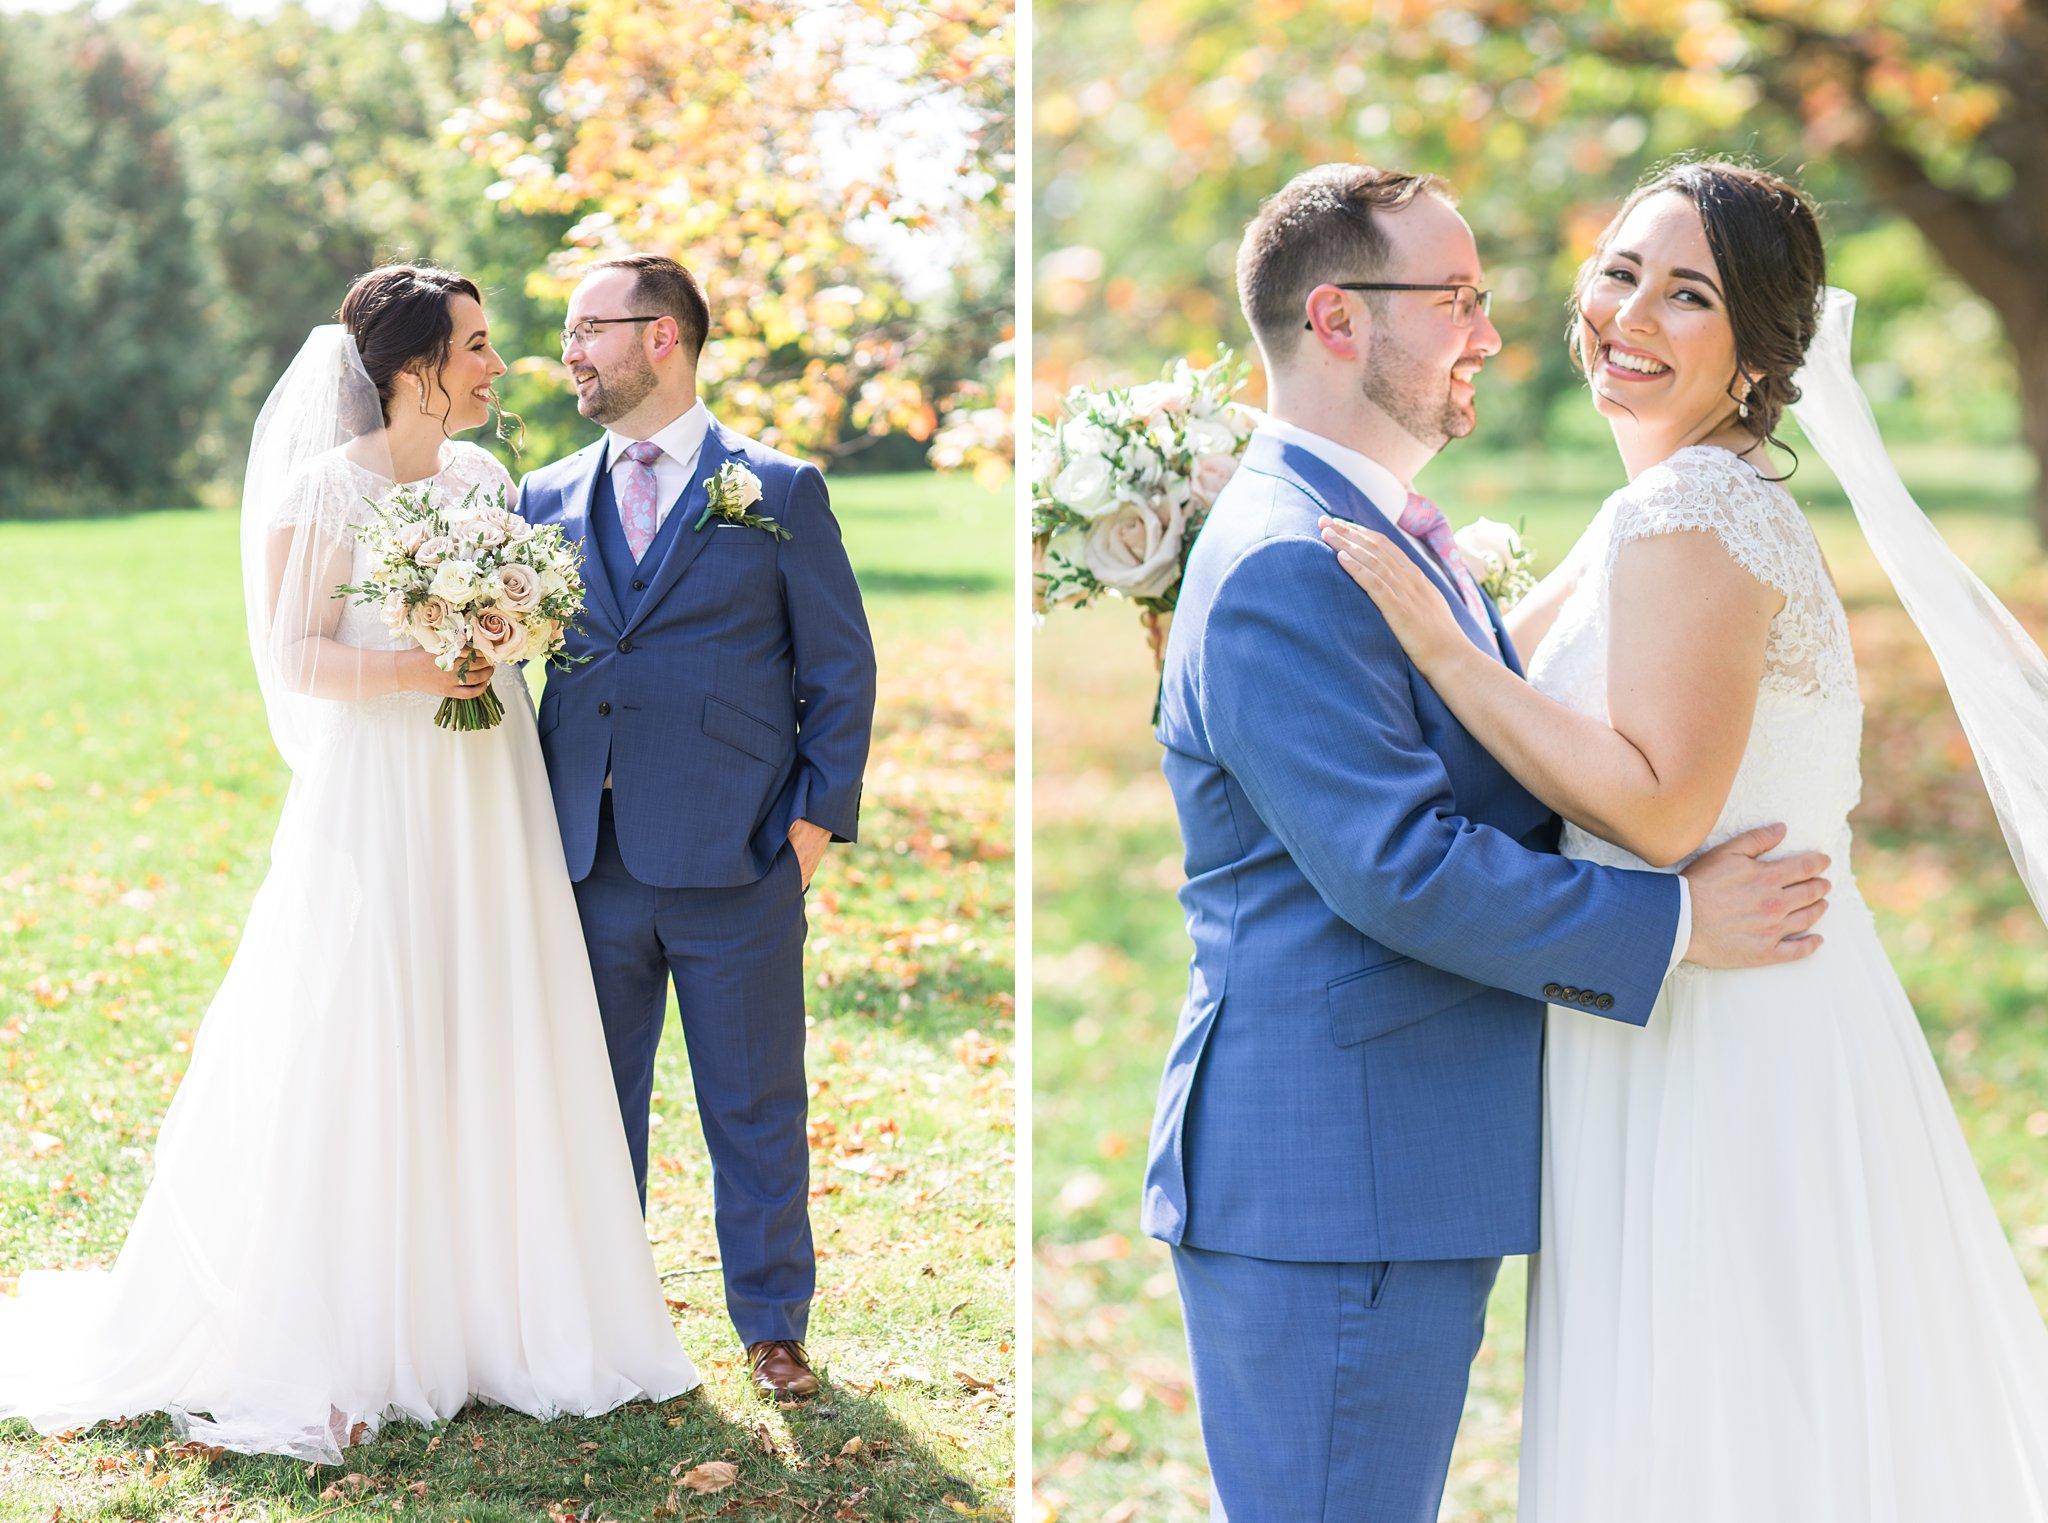 Laughing bride, Arboretum fall foliage, Britannia Yacht Club Wedding Photos, Amy Pinder Photography